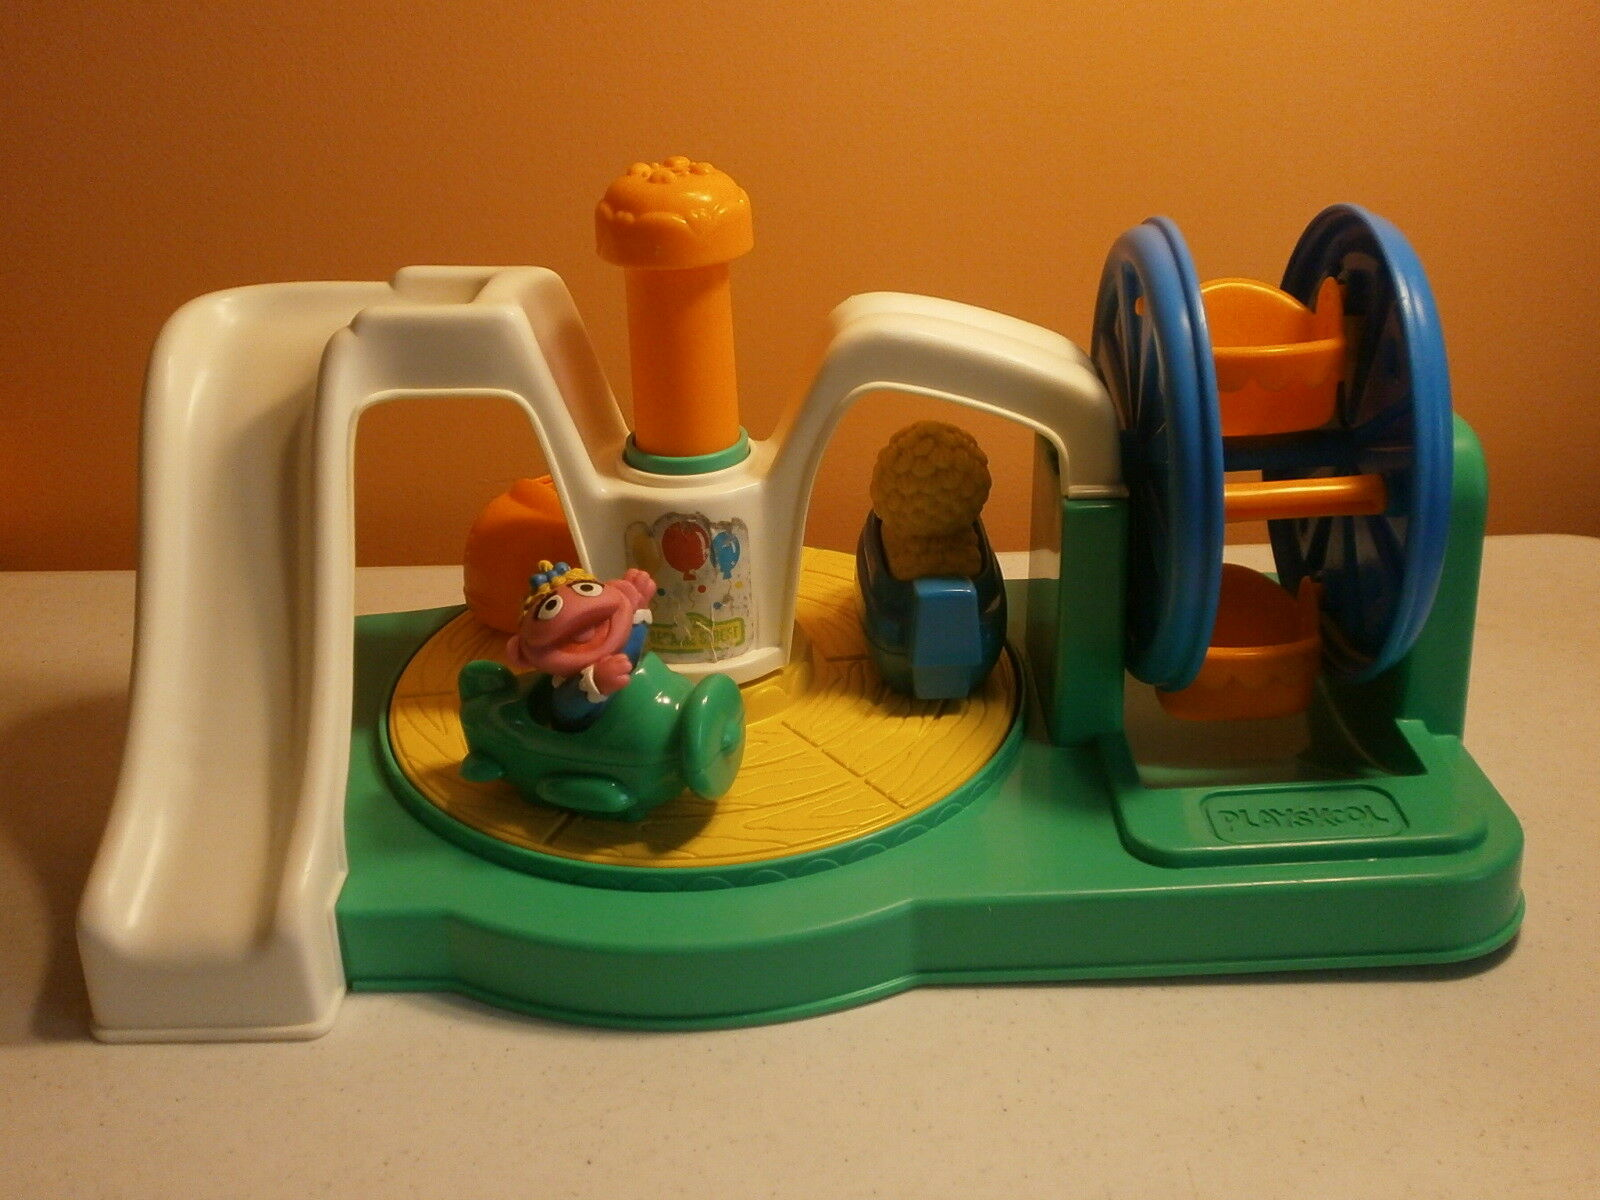 Playskool-Sesame Street-Push and Playground-1991-Vintage Spin Playground-1991-Vintage and e3600b